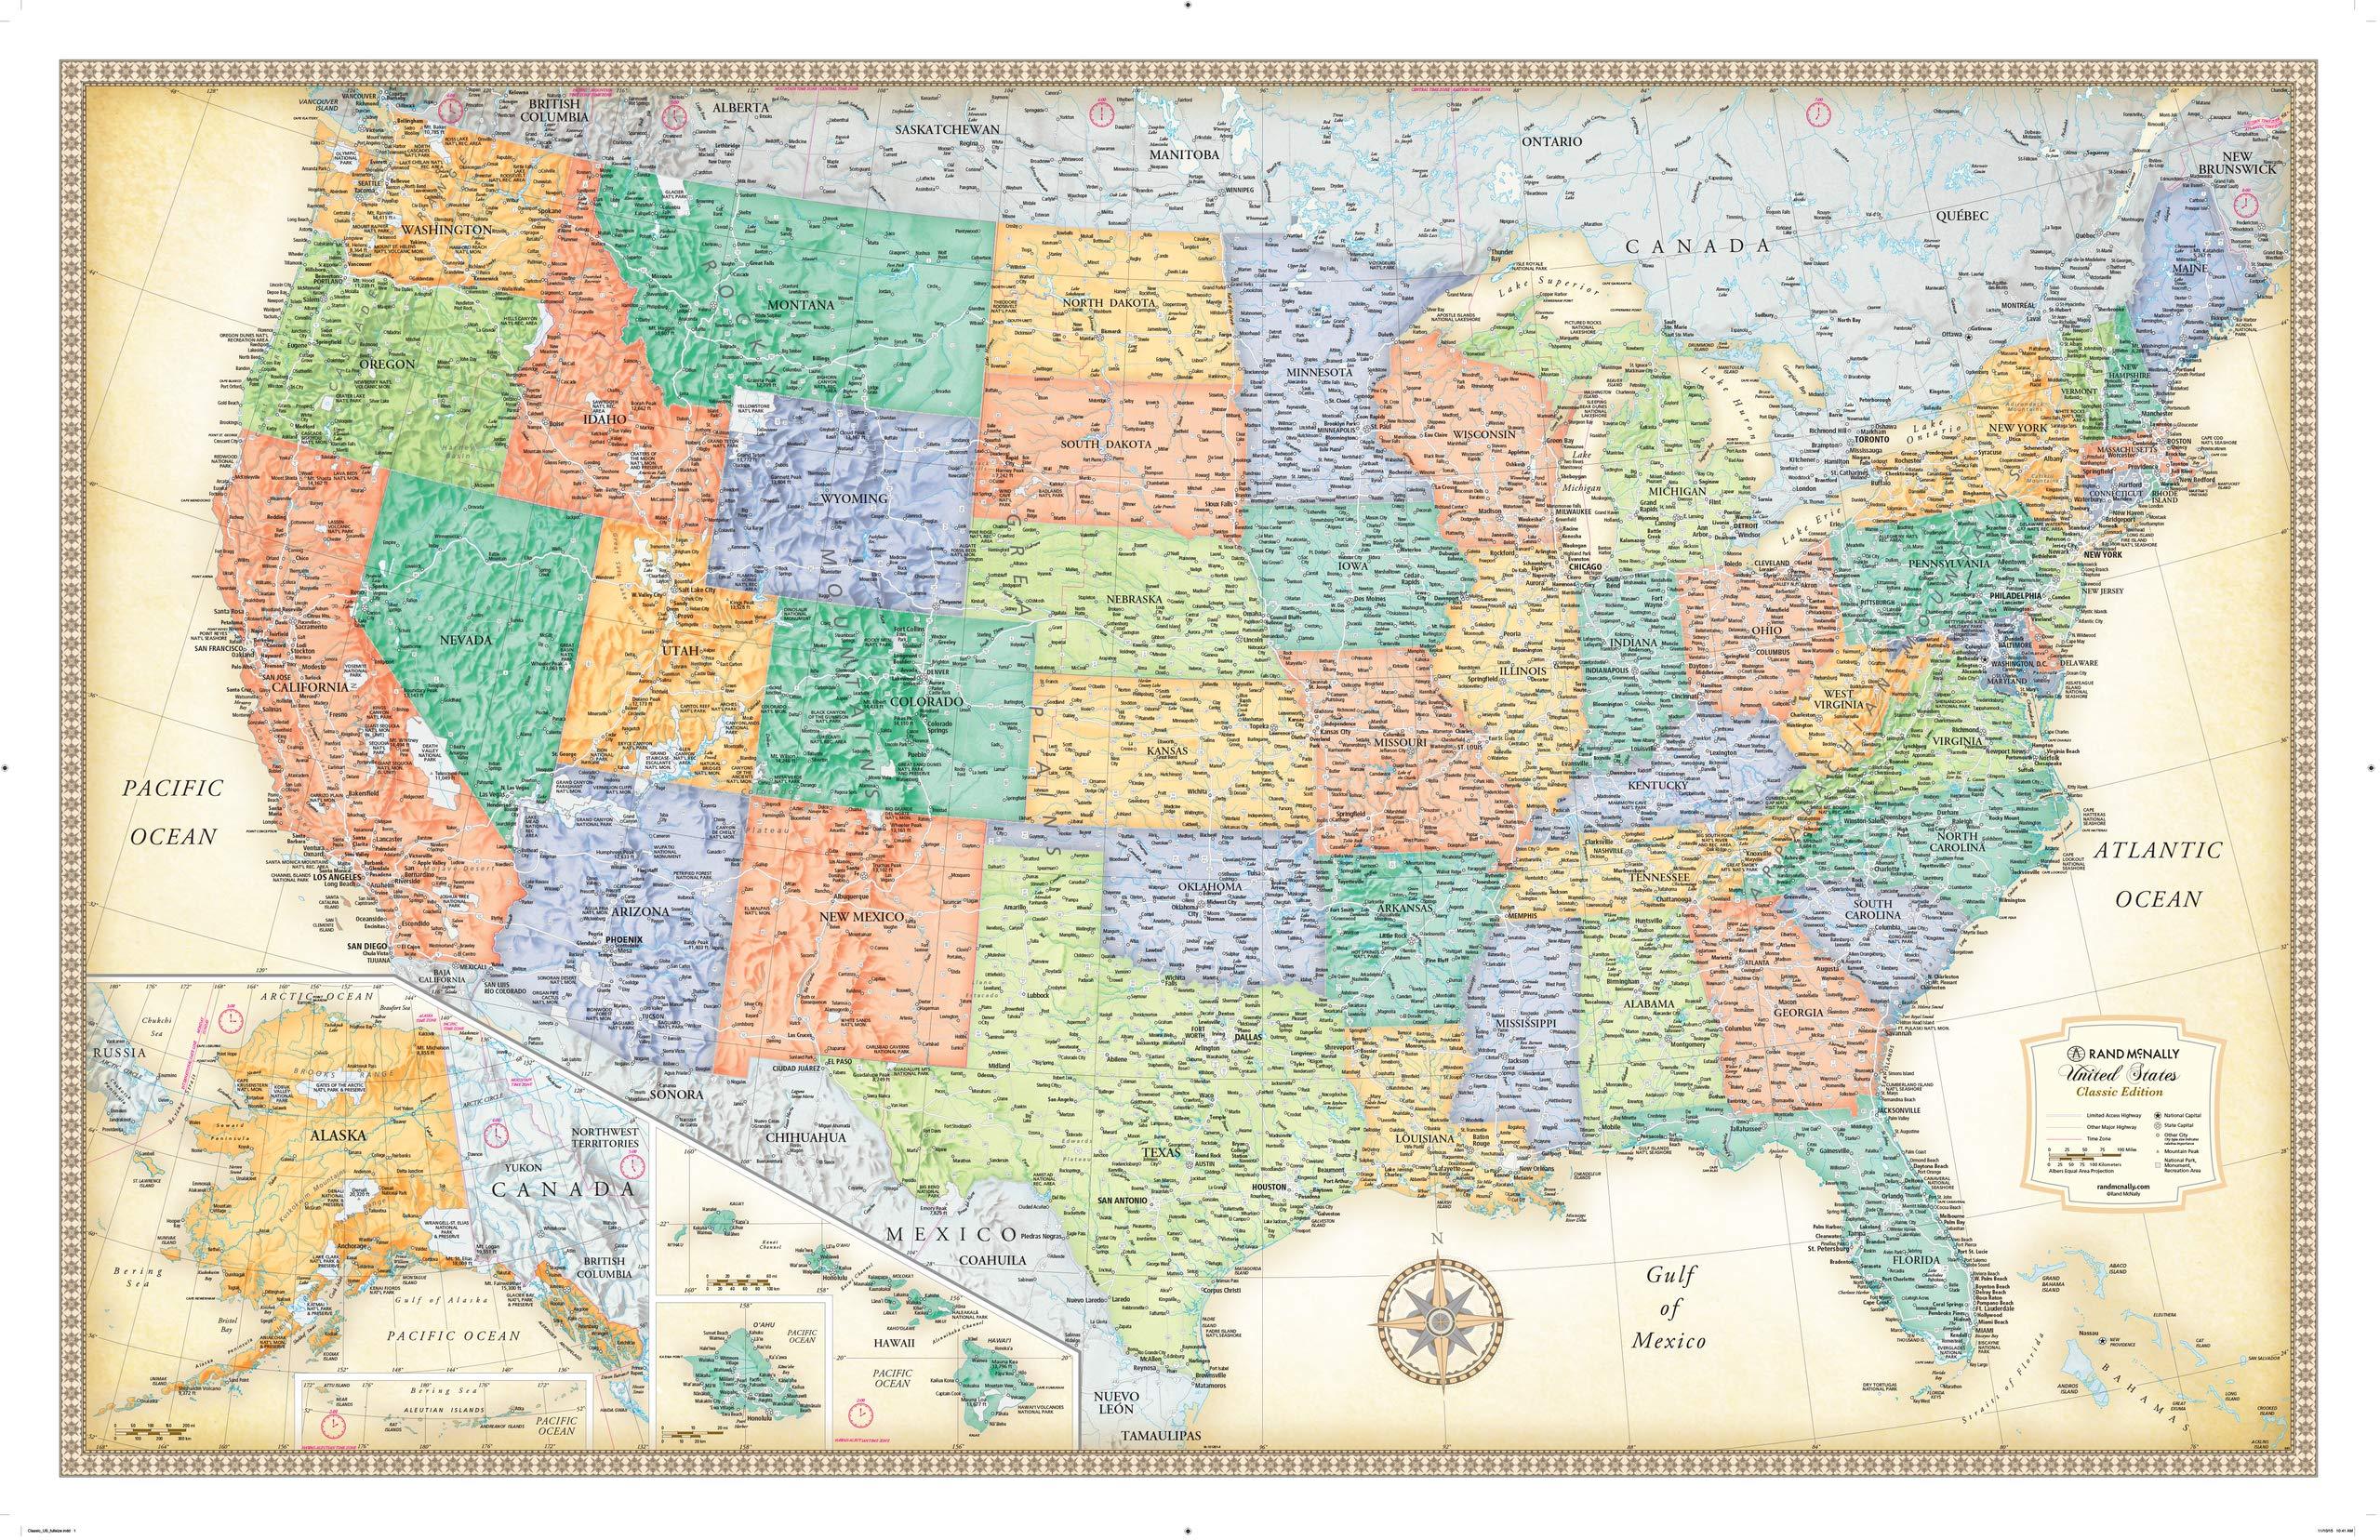 Rand Mcnally Classic United States Wall Map Rand Mcnally 9780528012785 Amazon Com Books